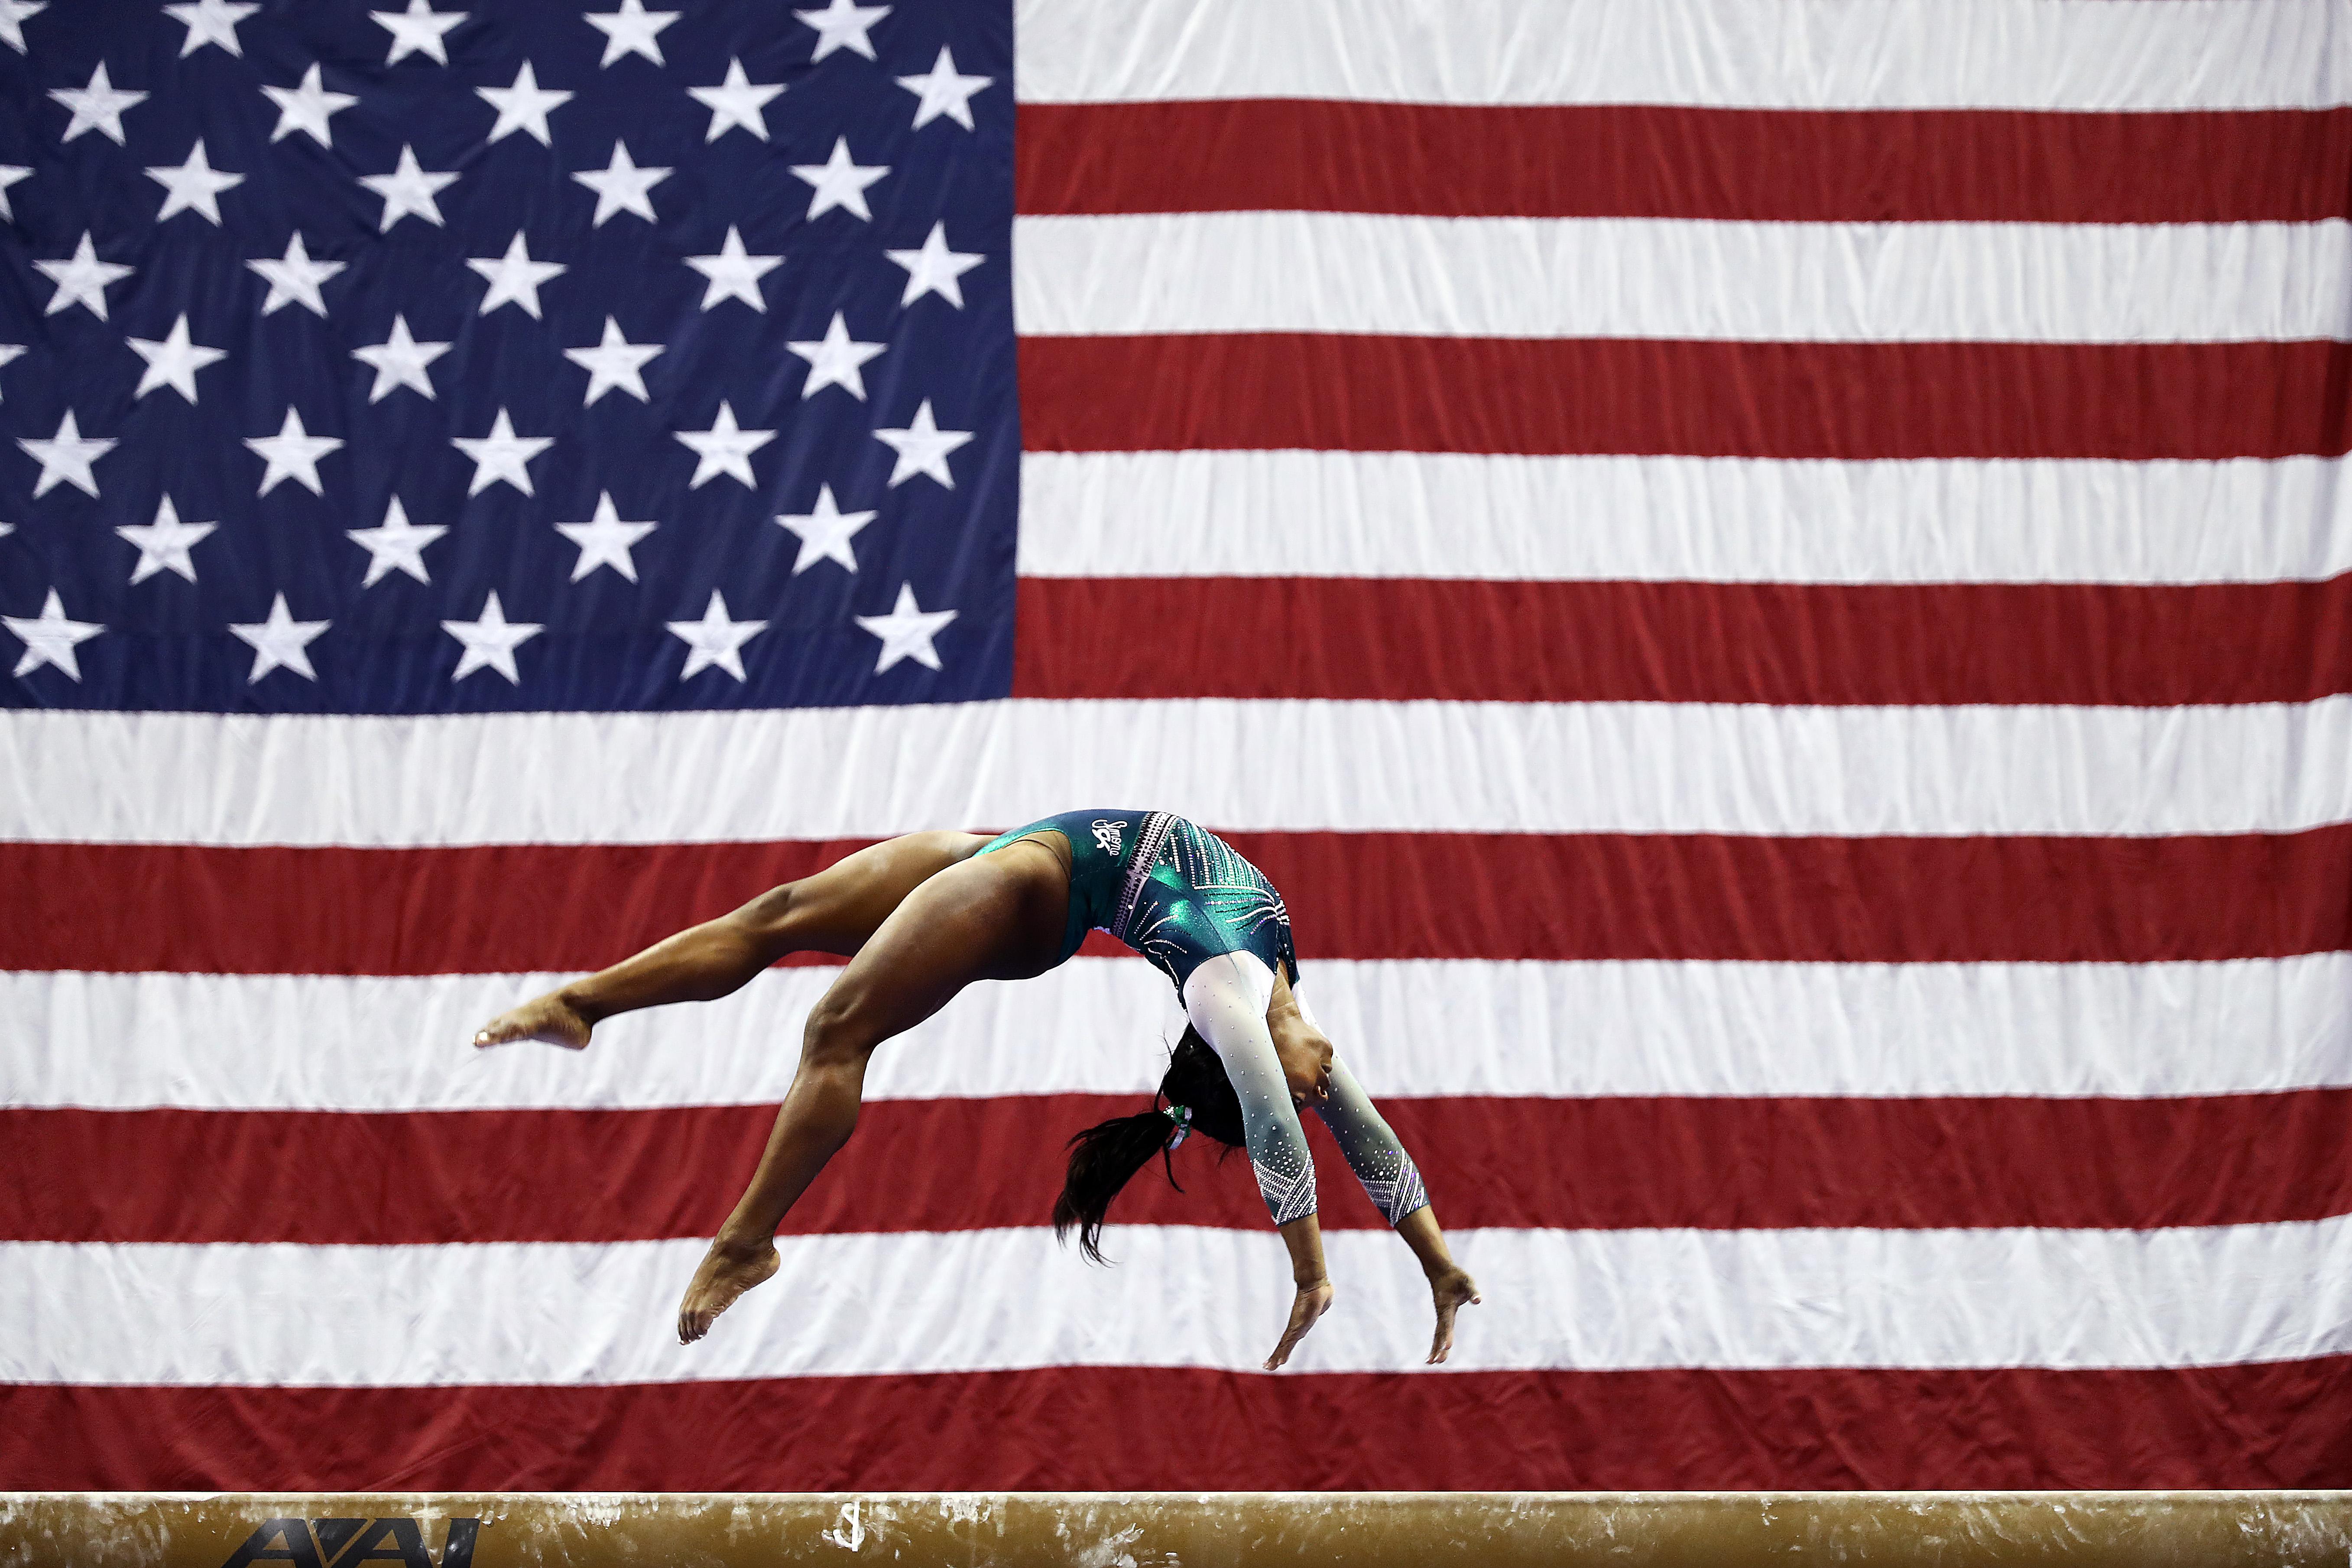 Simone Biles makes history with balance beam dismount at US women's gymnastics championship